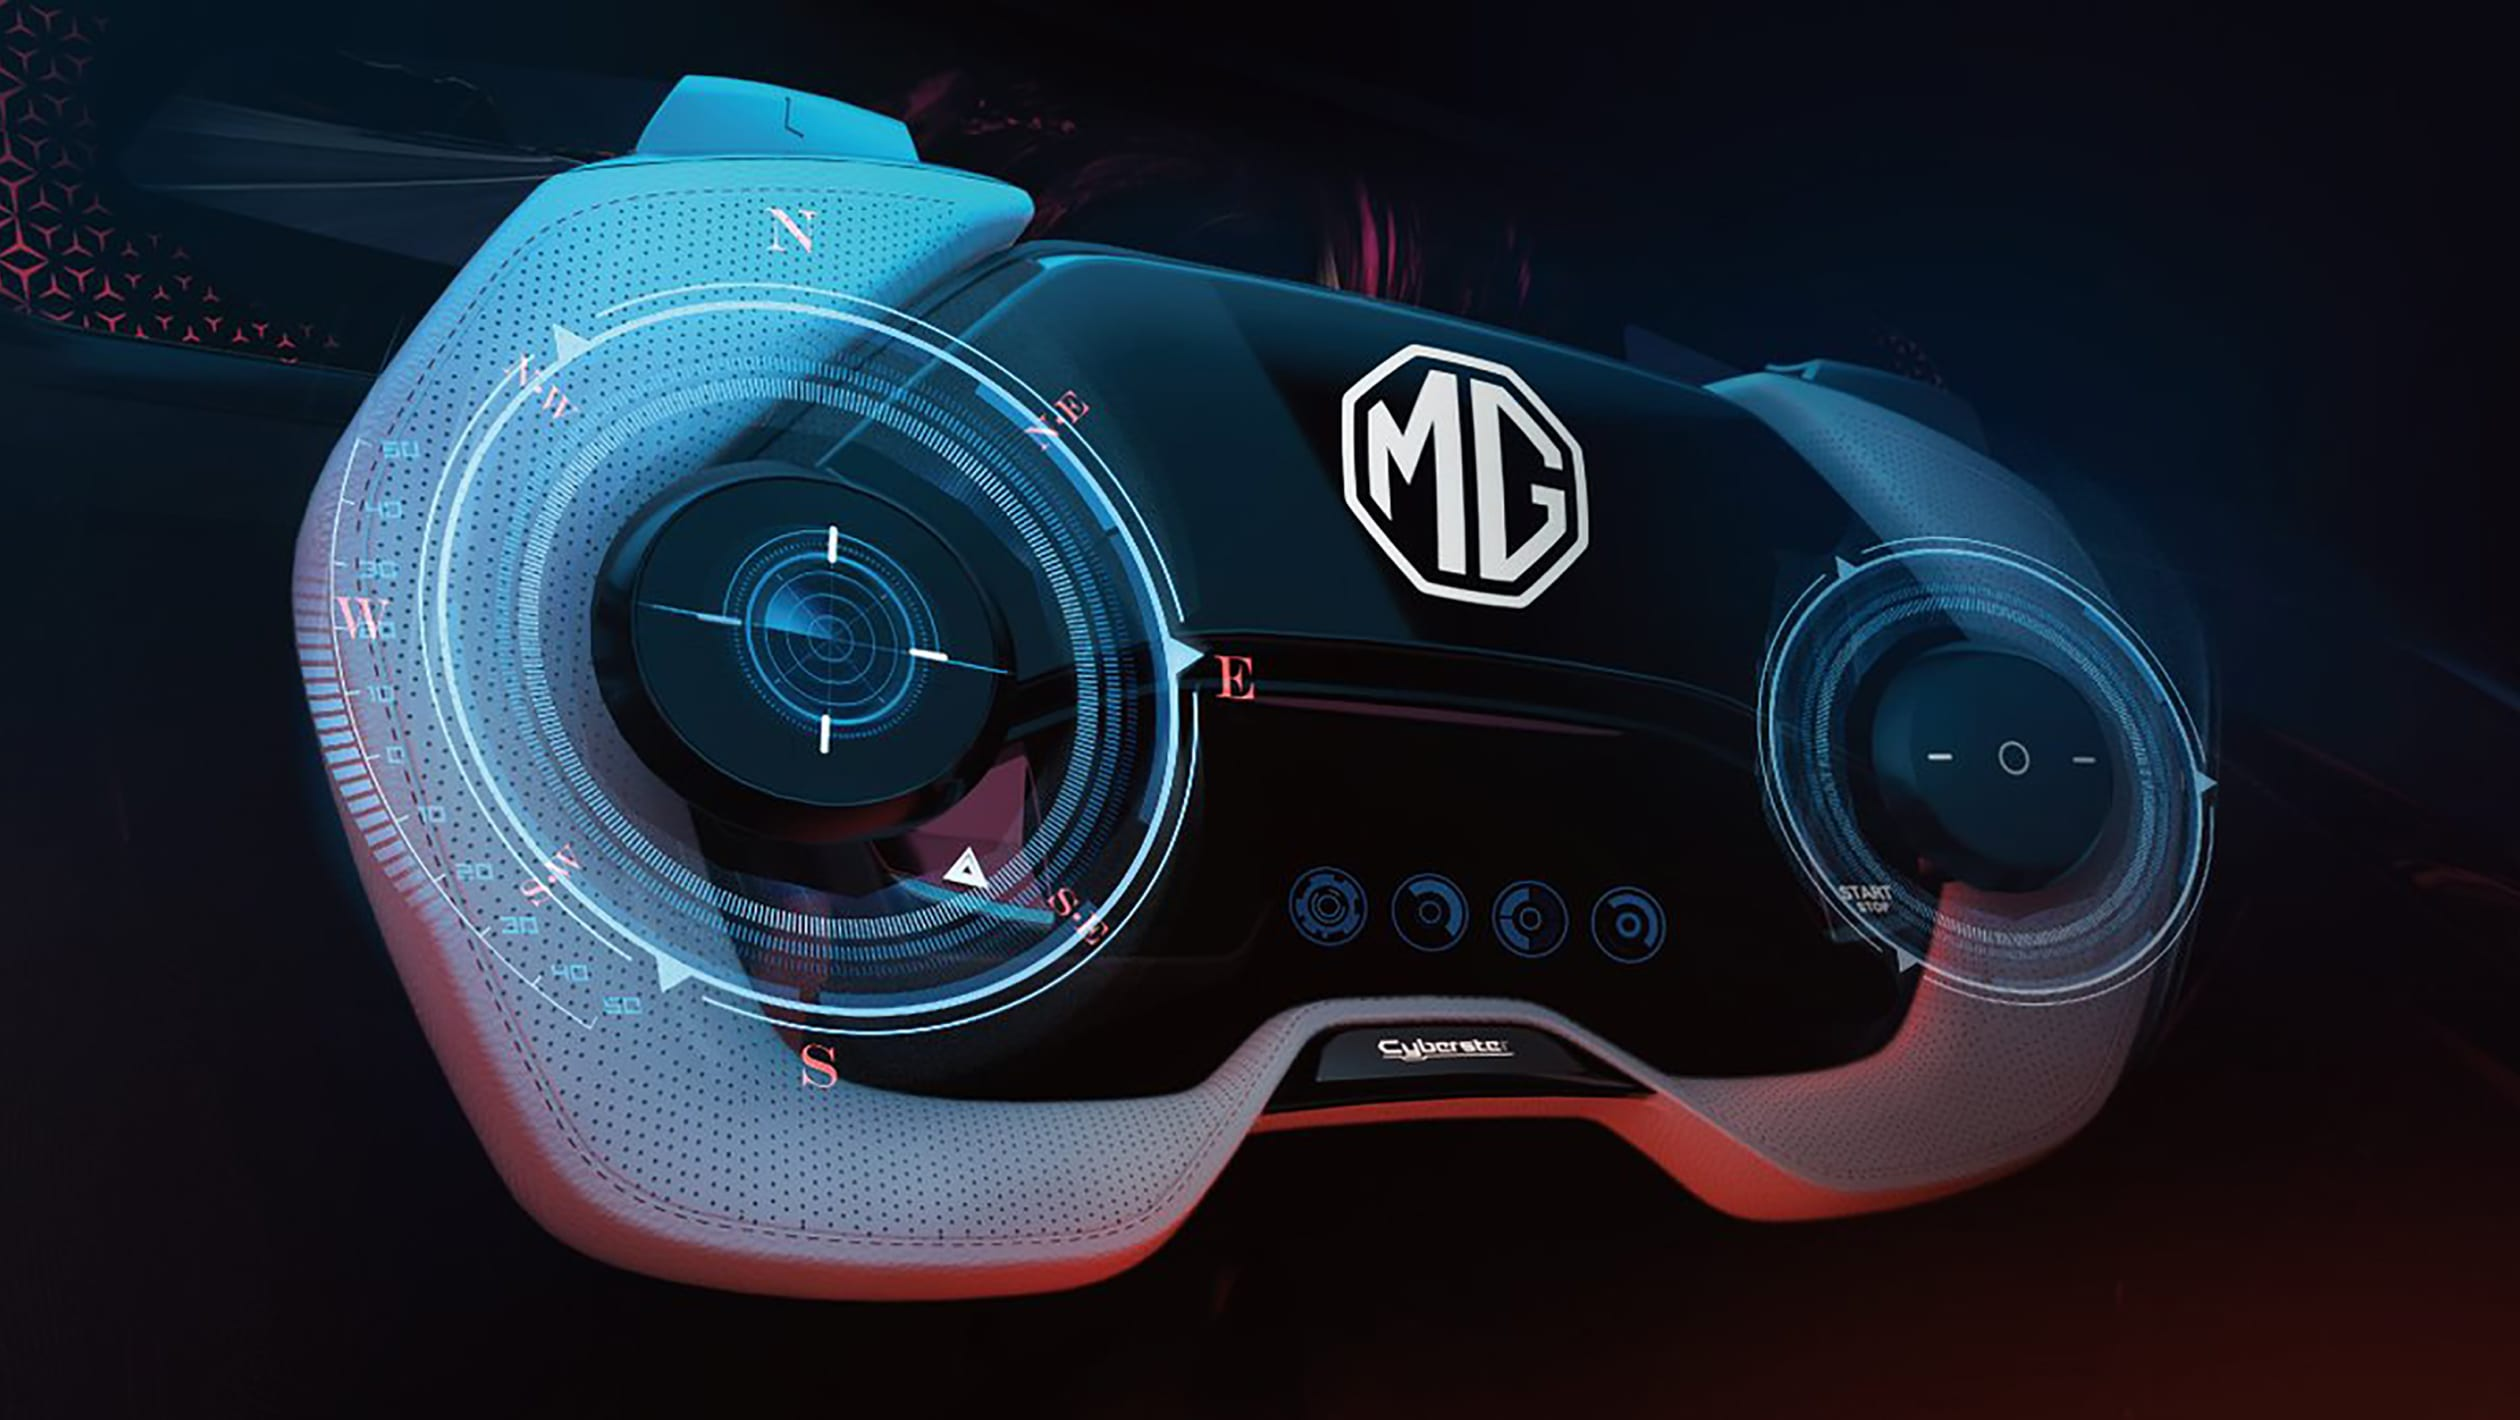 mg-cyberster-interior-2